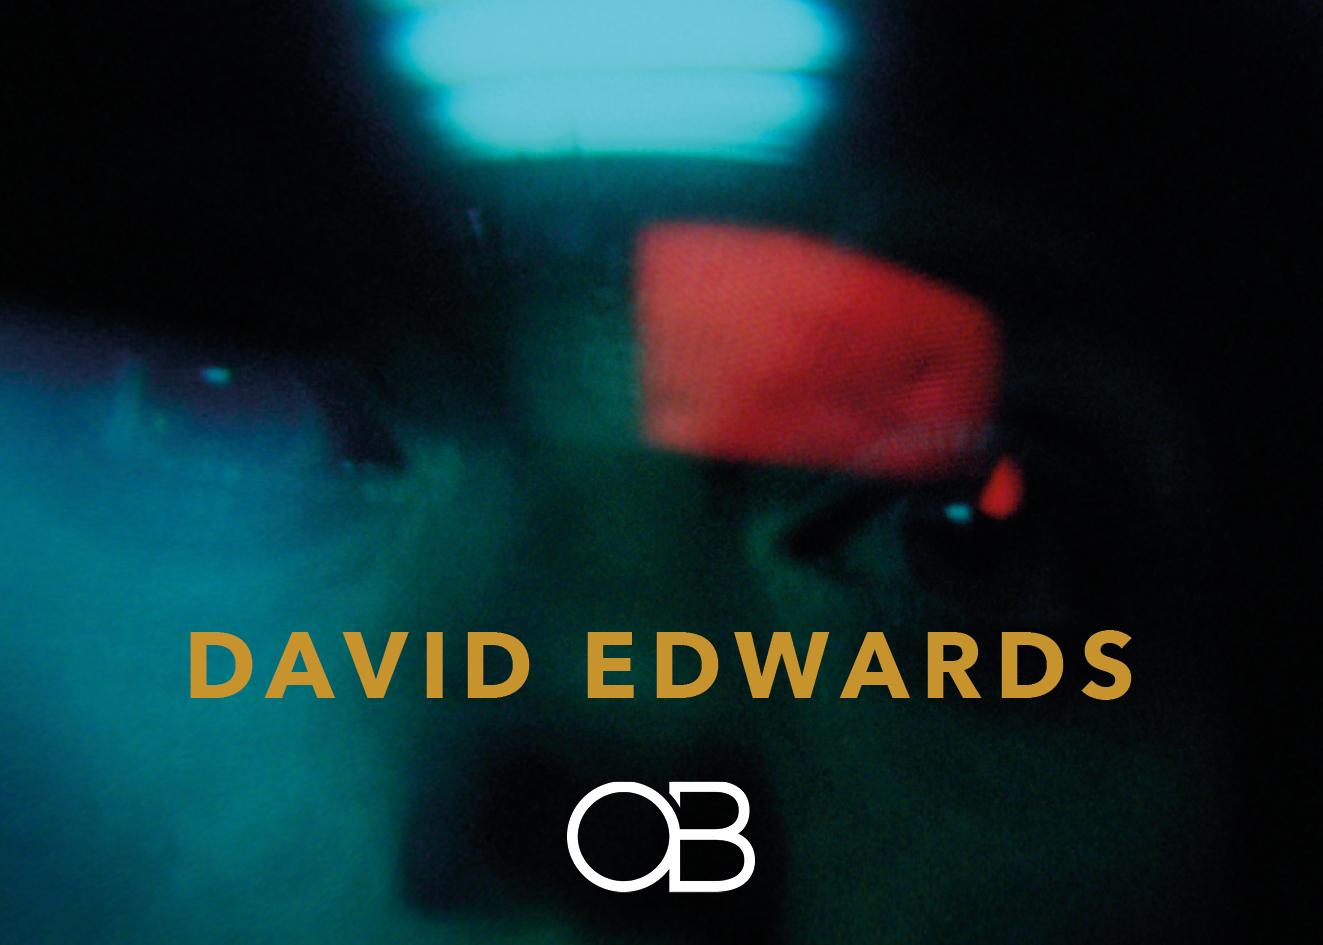 David Edwards Signed by OB Management